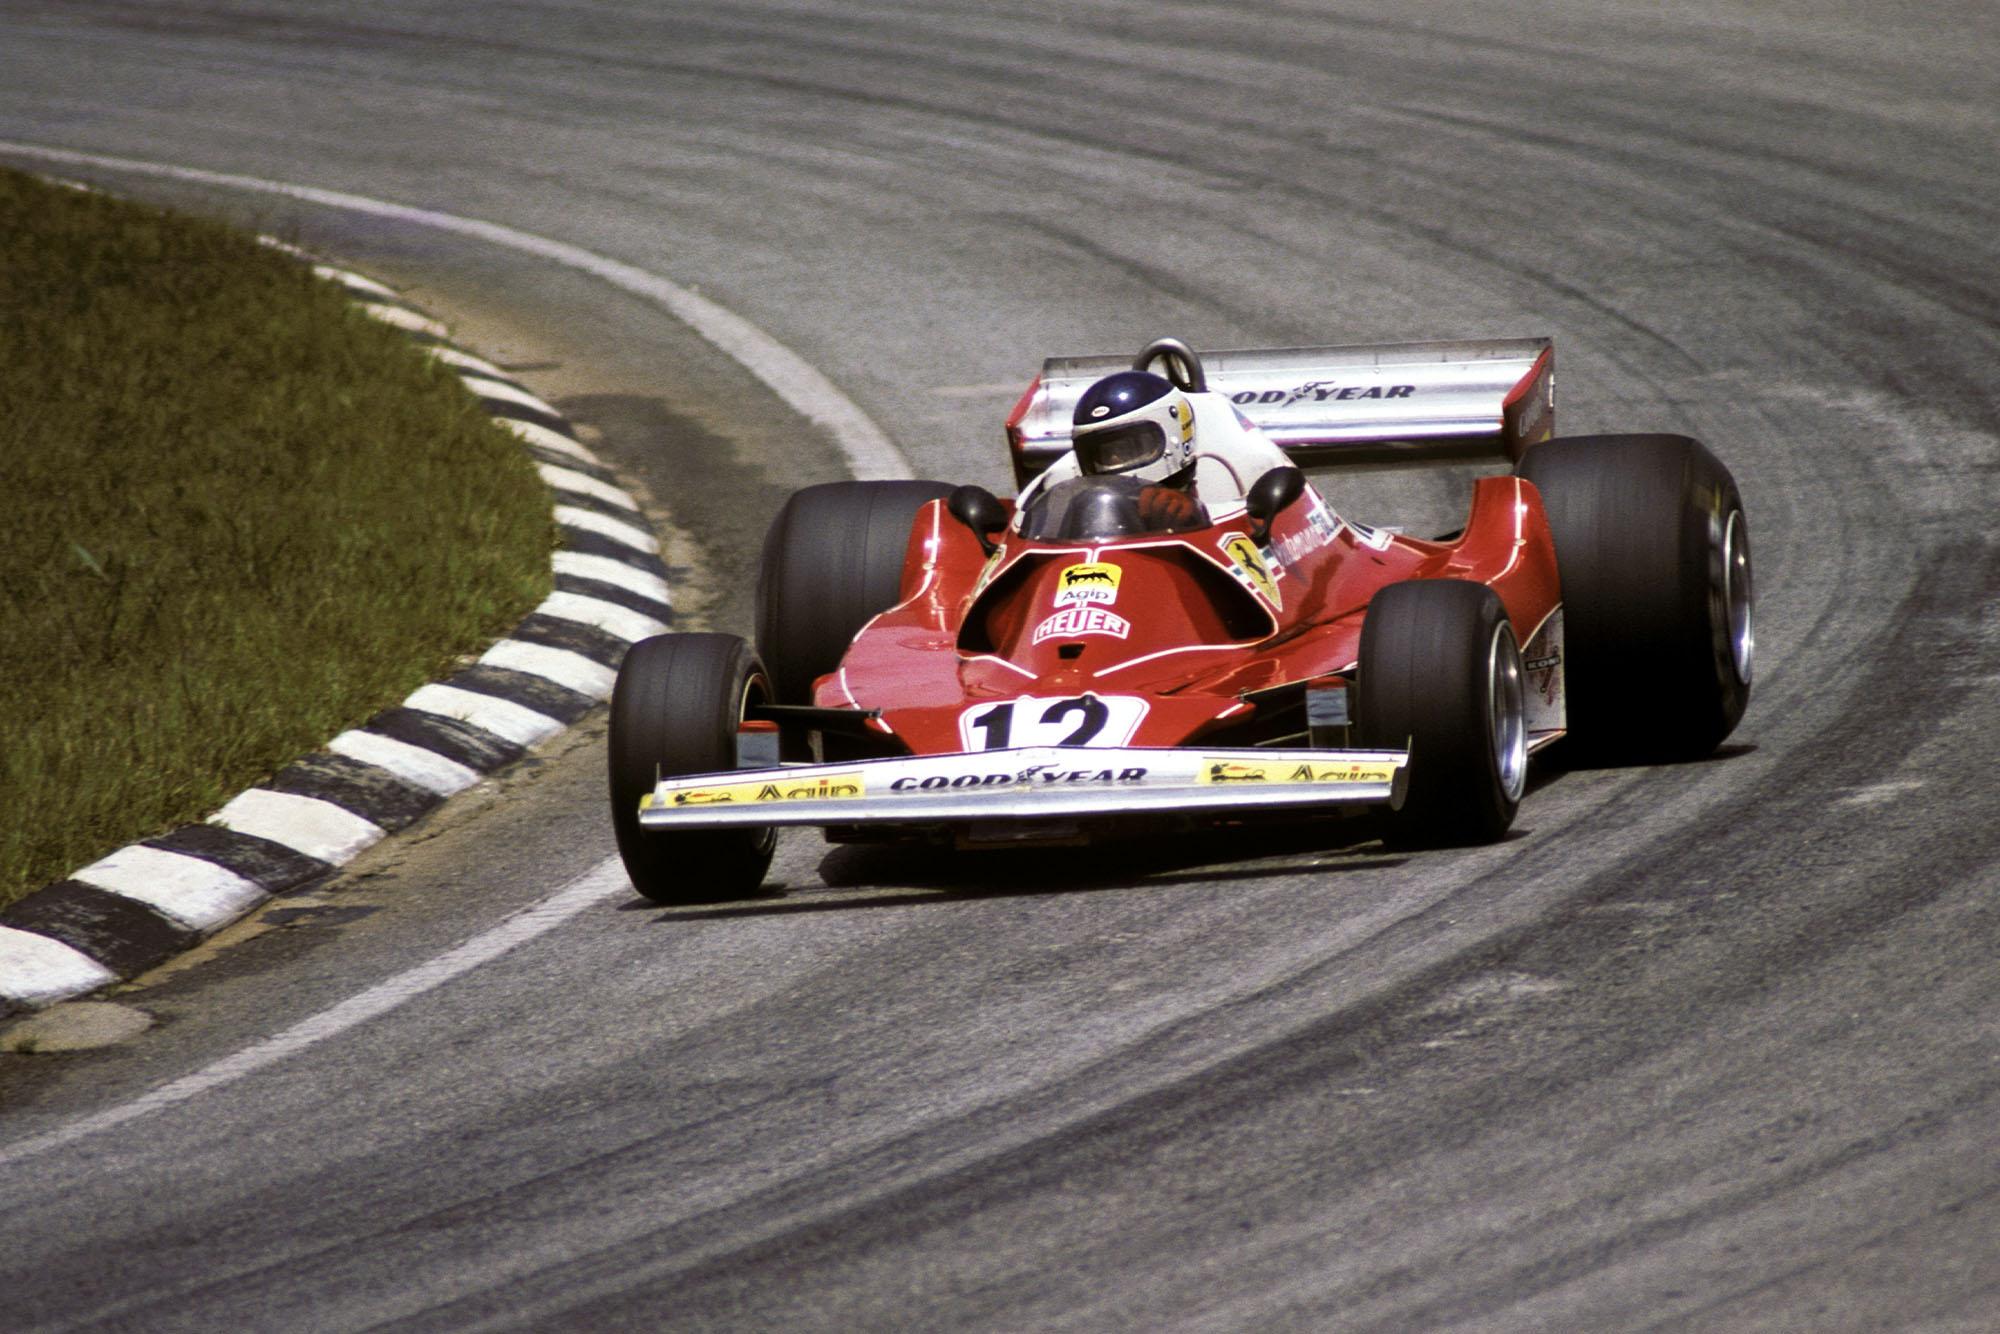 Carlos Reutemann driving for Ferrari at the 1977 Brazilian Grand Prix, Interlagos.